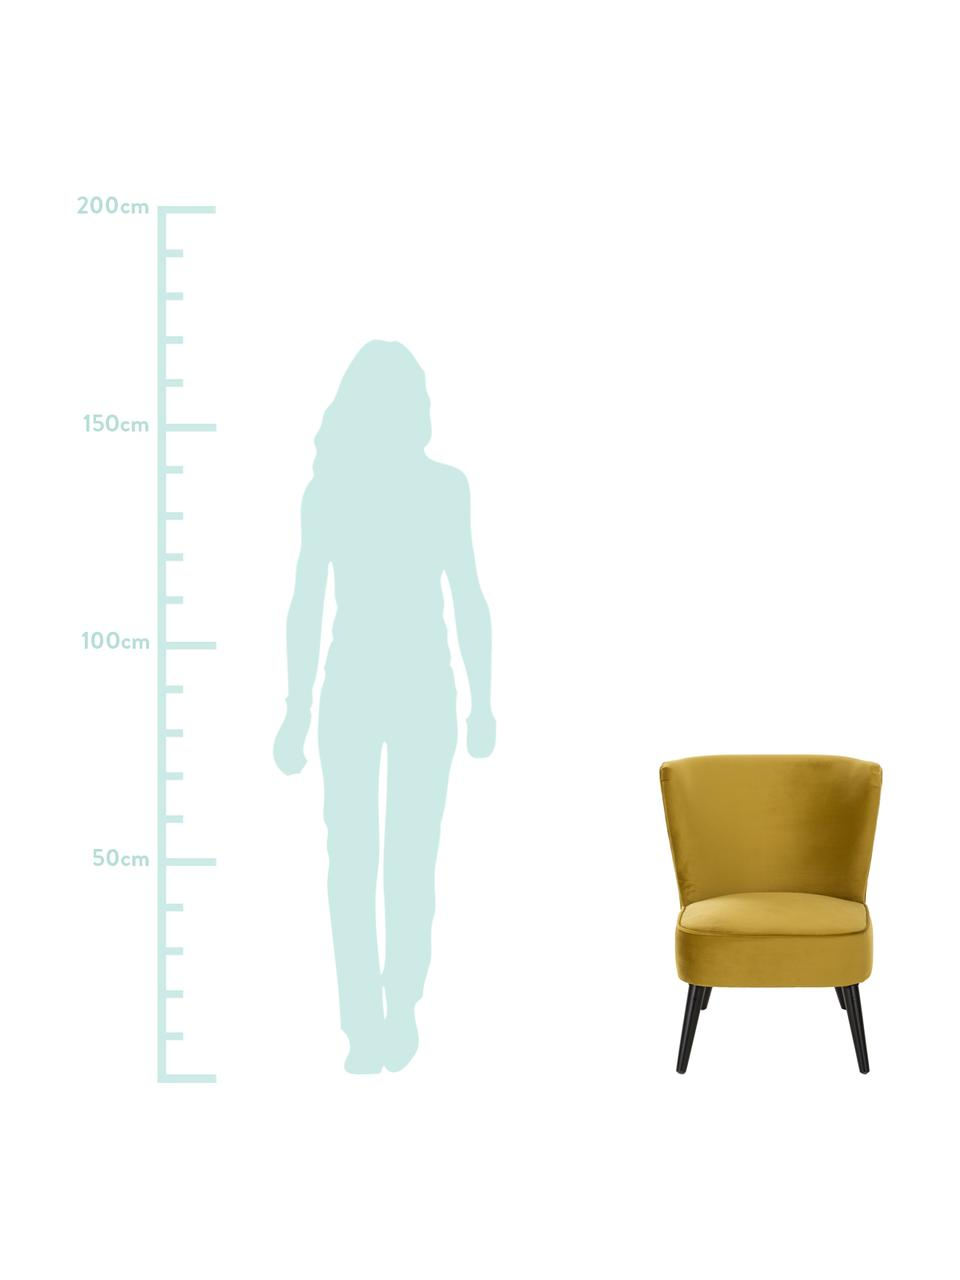 Samt-Cocktailsessel Robine in Olivgelb, Bezug: Samt (Polyester) Der hoch, Füße: Kiefernholz, lackiert, Samt Olivgelb, B 63 x T 73 cm